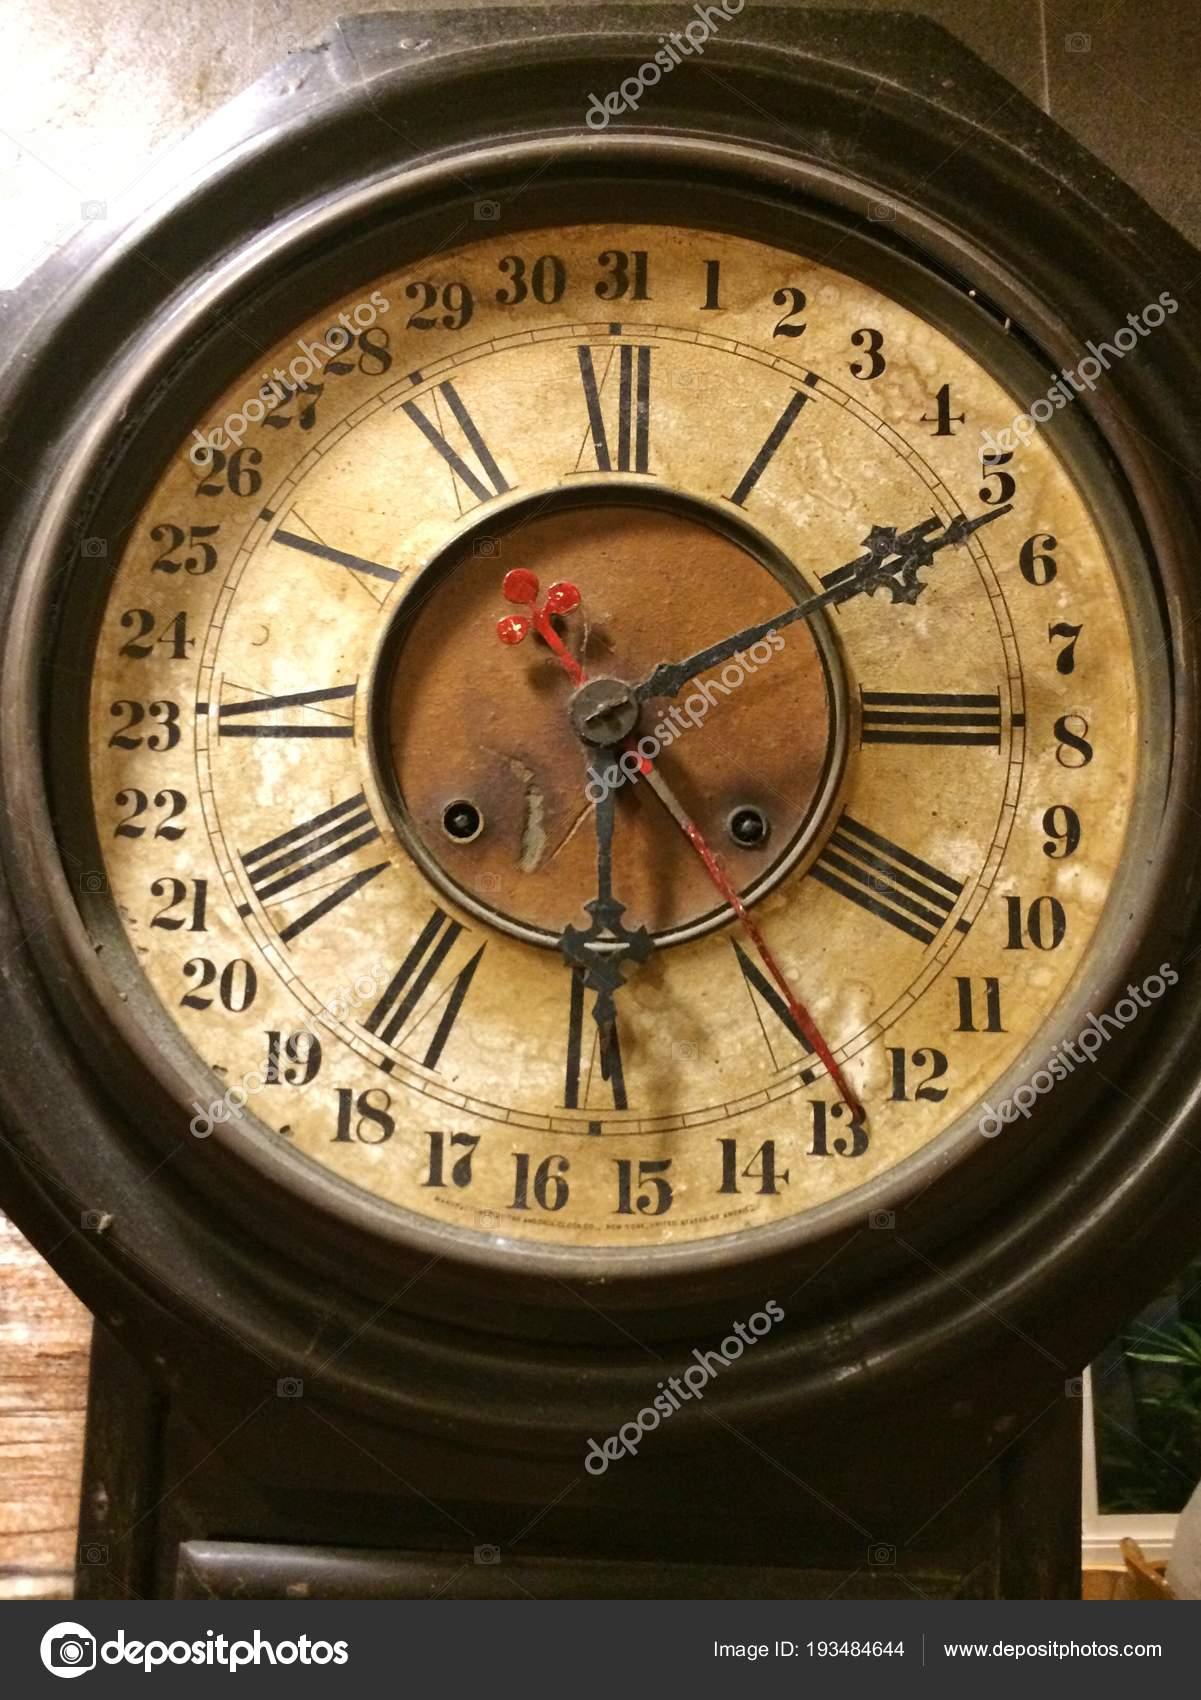 Relojes Antiguos Pared Ladrillo Fotos De Stock Thattep 193484644